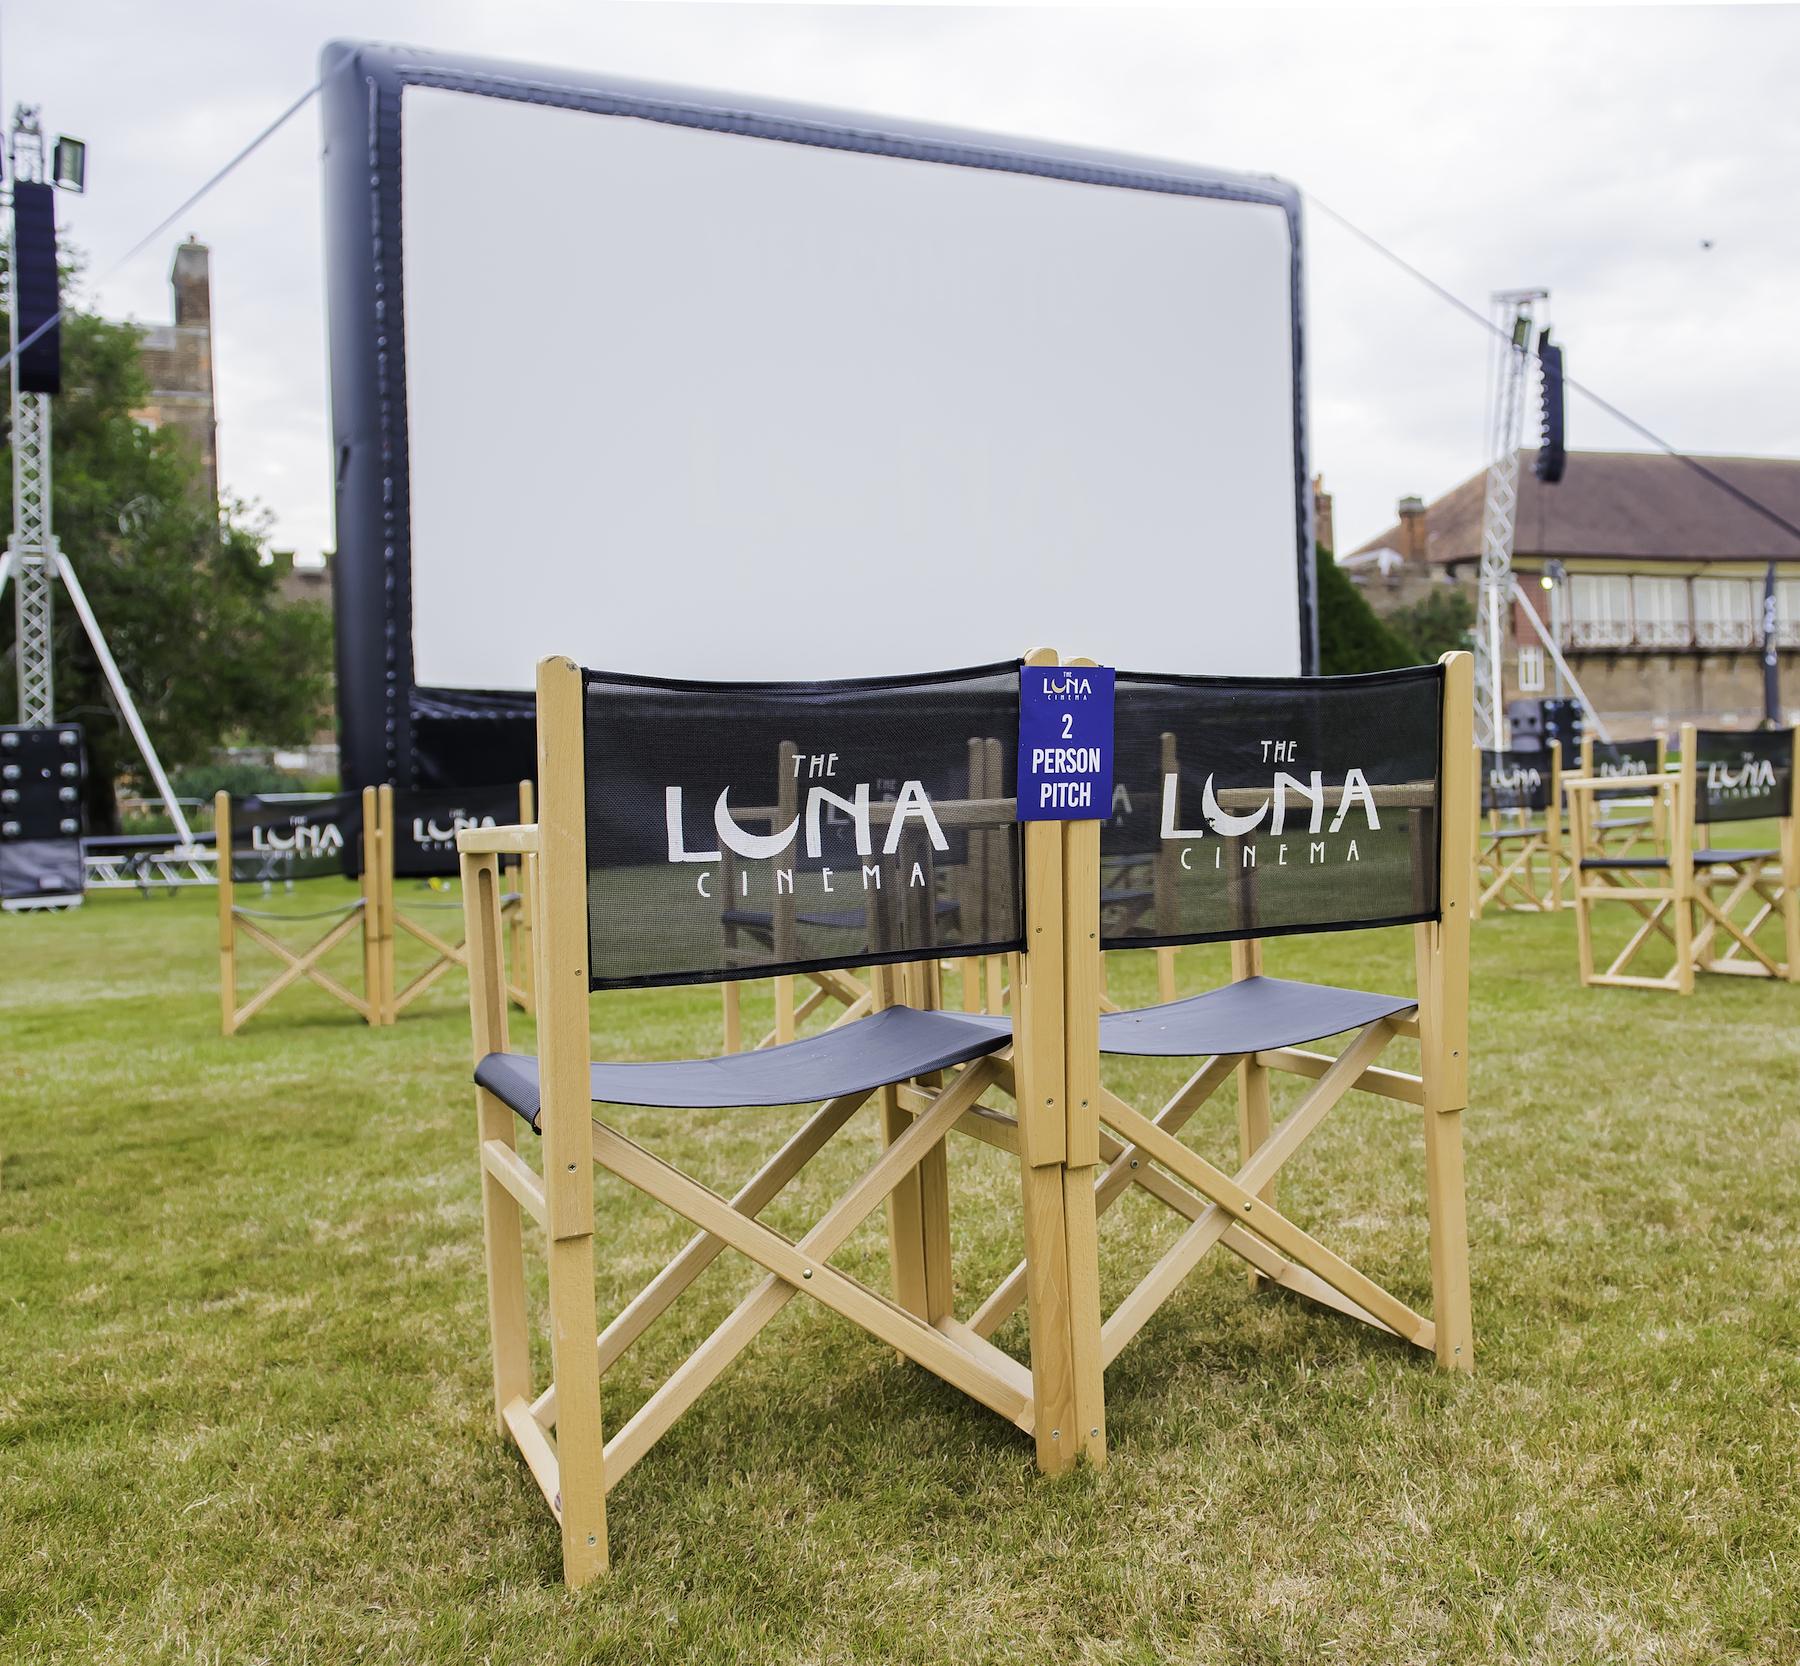 Luna Cinema at the Royal Hospital